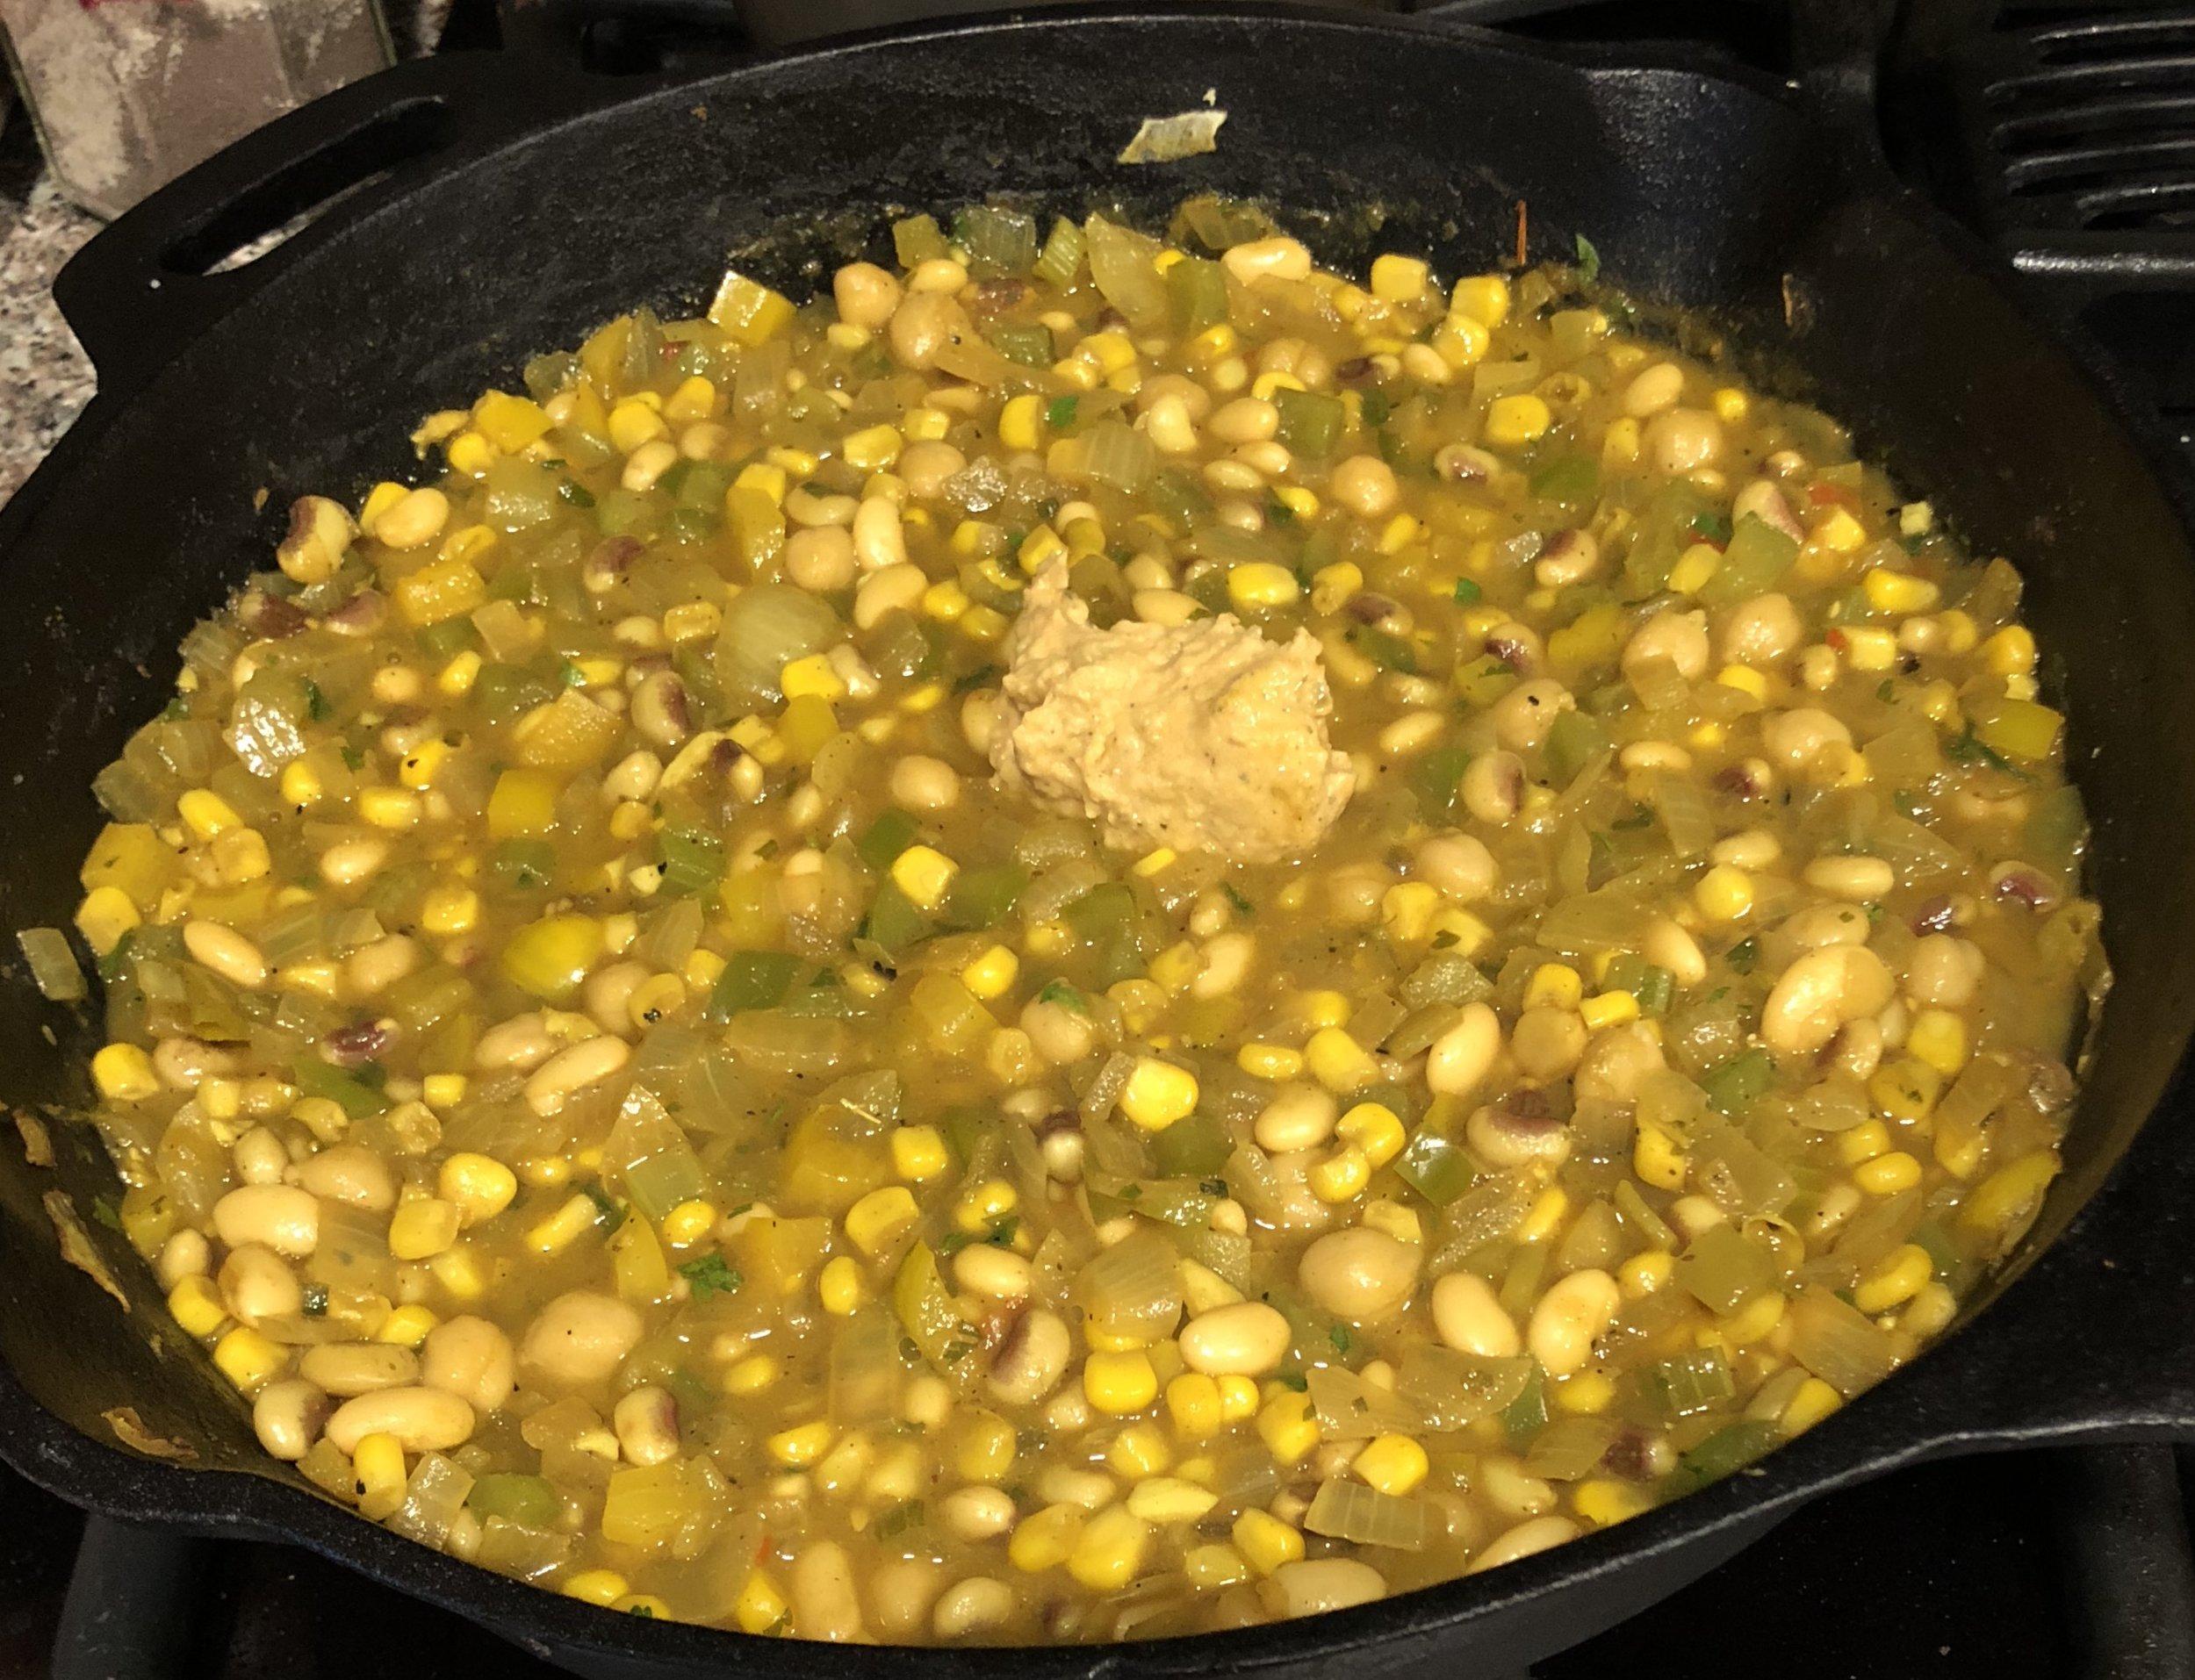 Green Chili Chili Cooking With Added Hummus.jpg